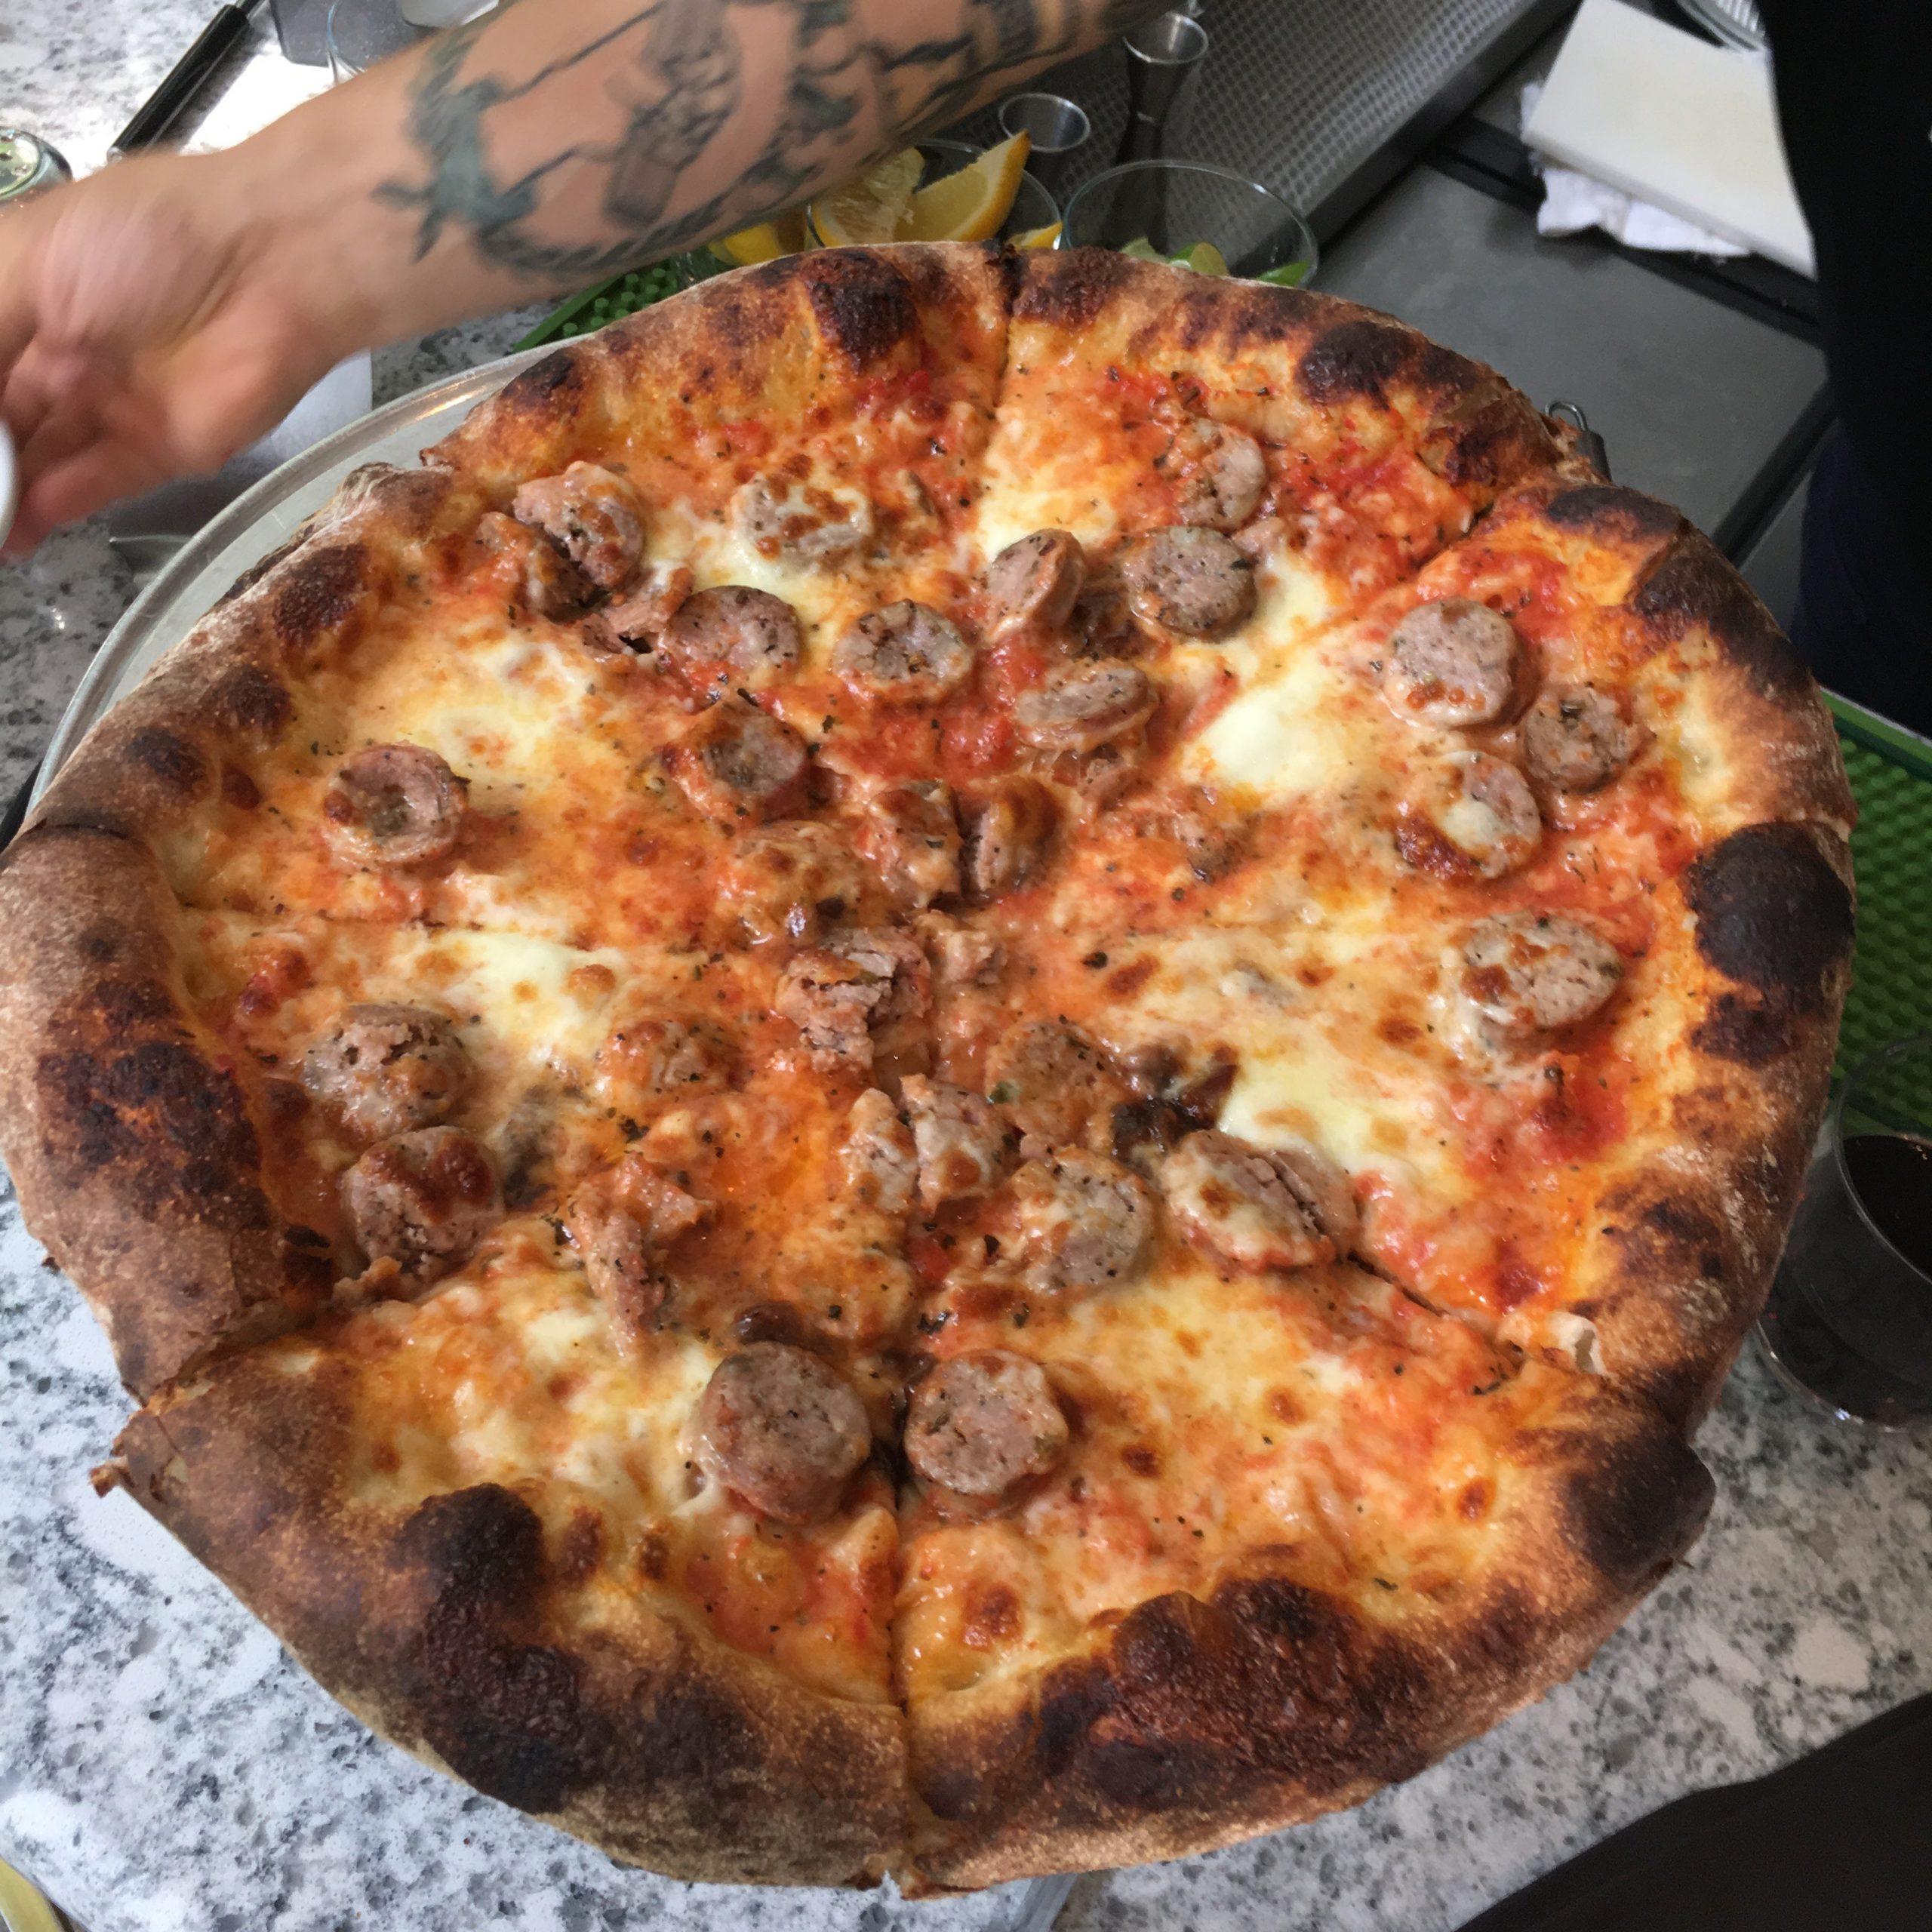 Sausage and onion, Robert's Pizza Company